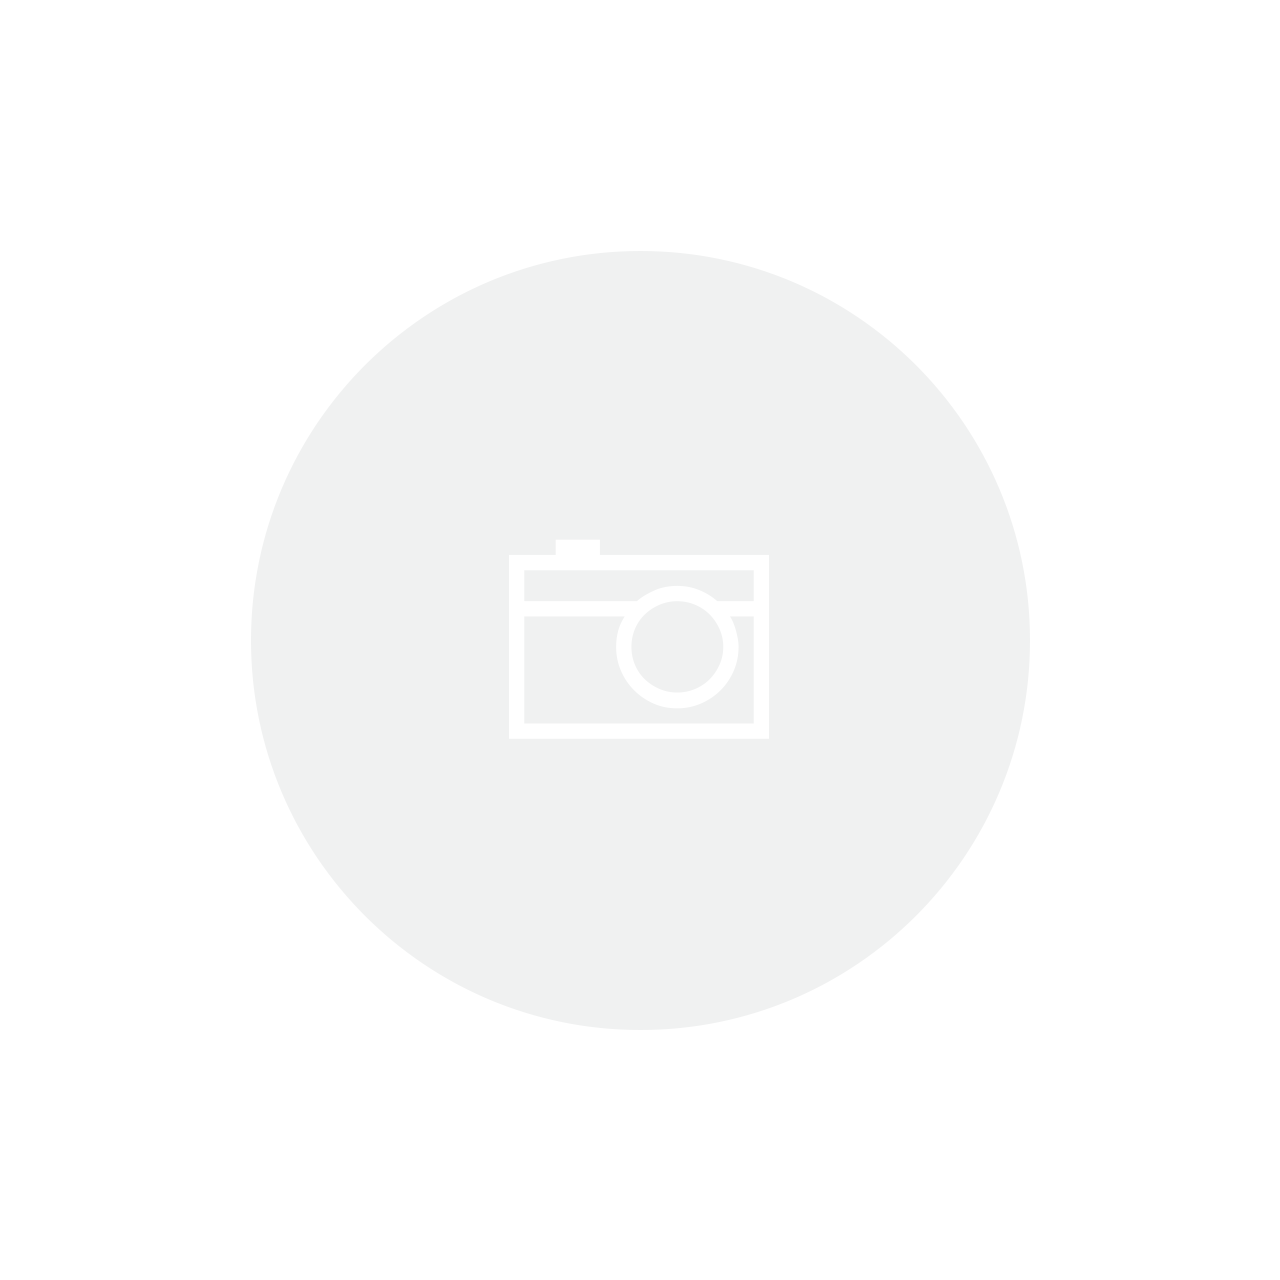 SELIM CHOPPER GW621 COMCANOTE 31,8MM